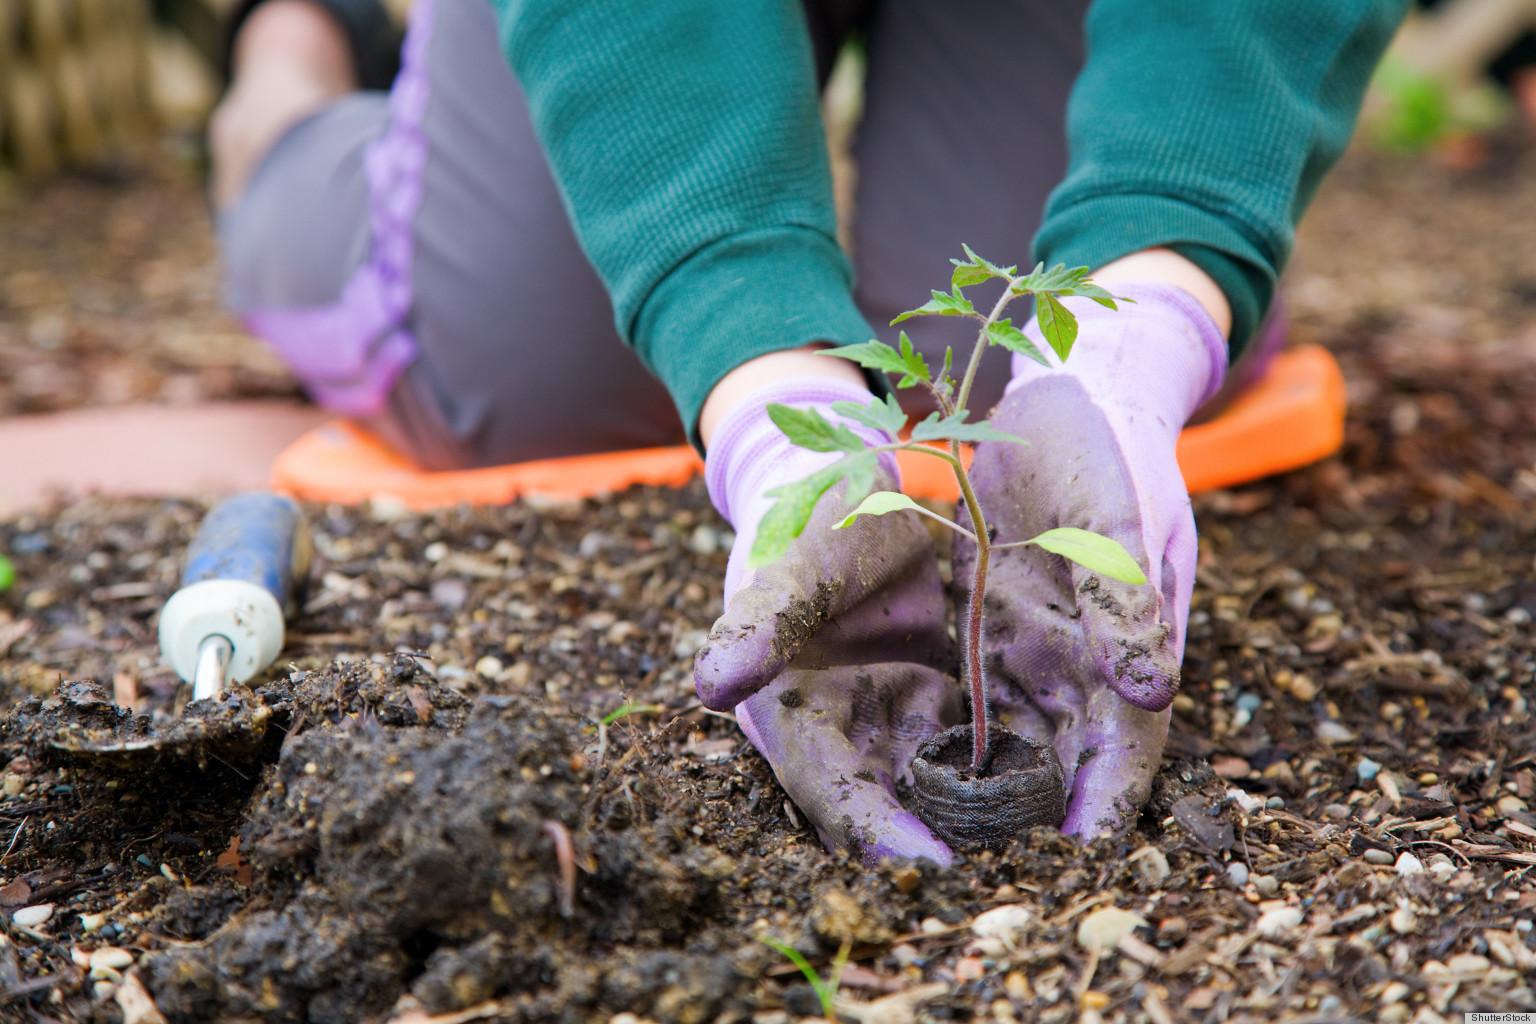 Overcoming Seasonal Affective Disorder With Gardening ...